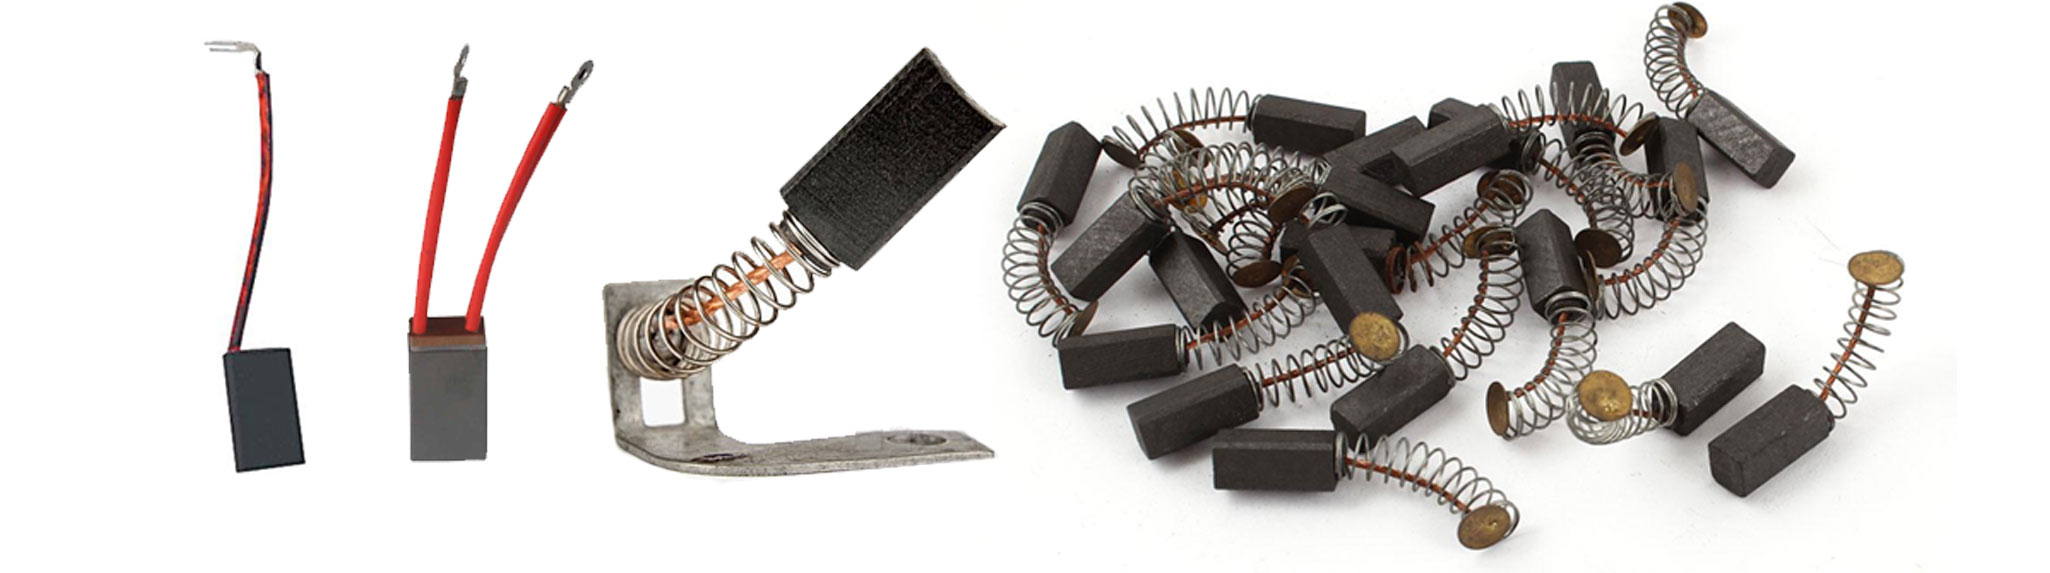 Carbon brushes dc motor brush manufacturers suppliers for Carbon motor brushes suppliers